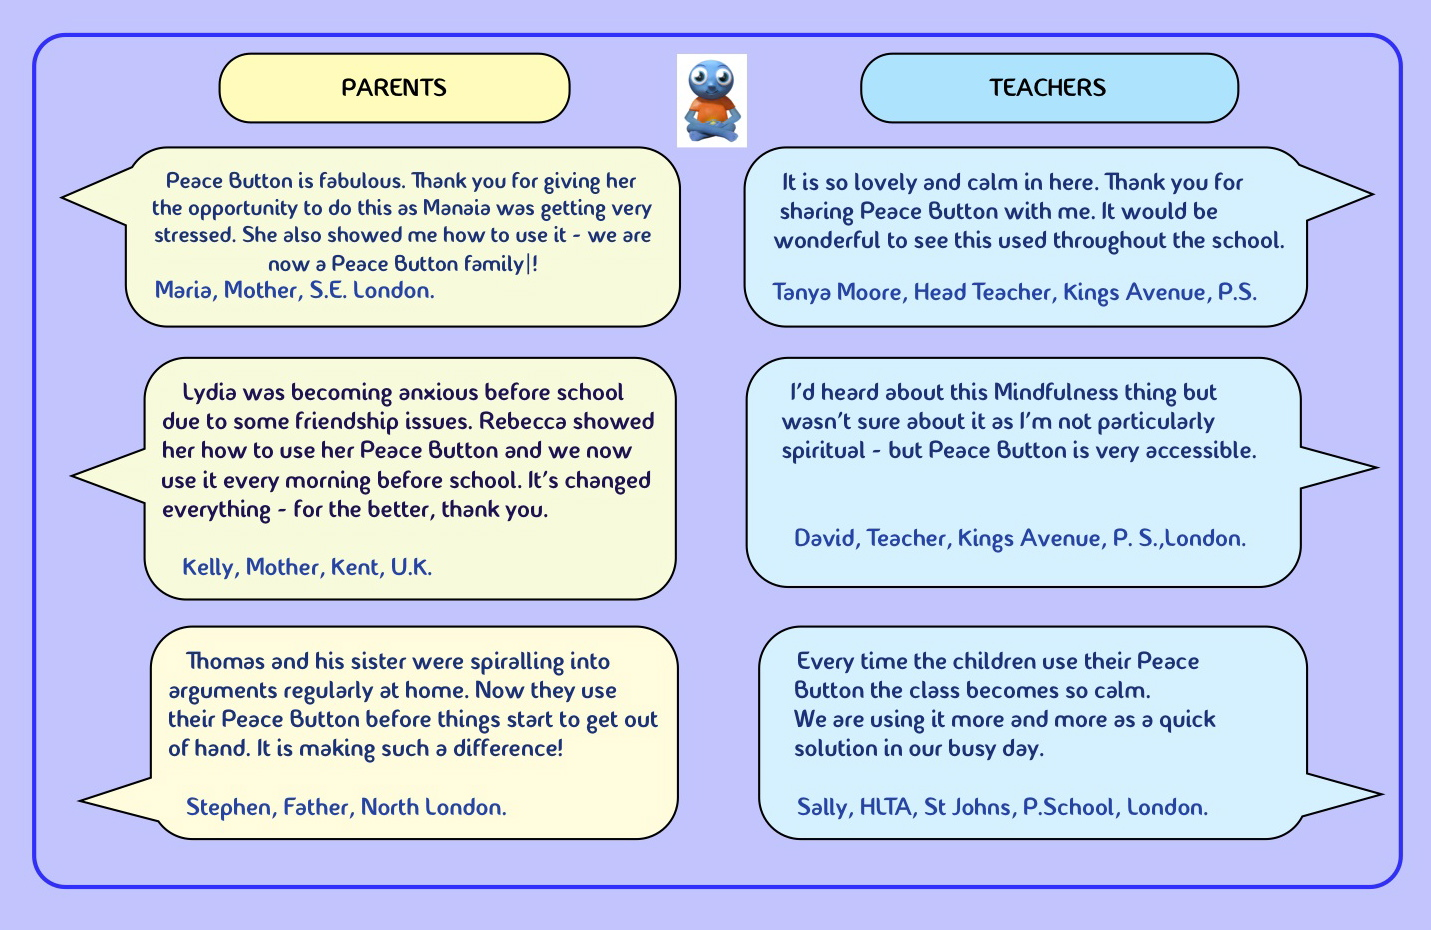 School testimonials